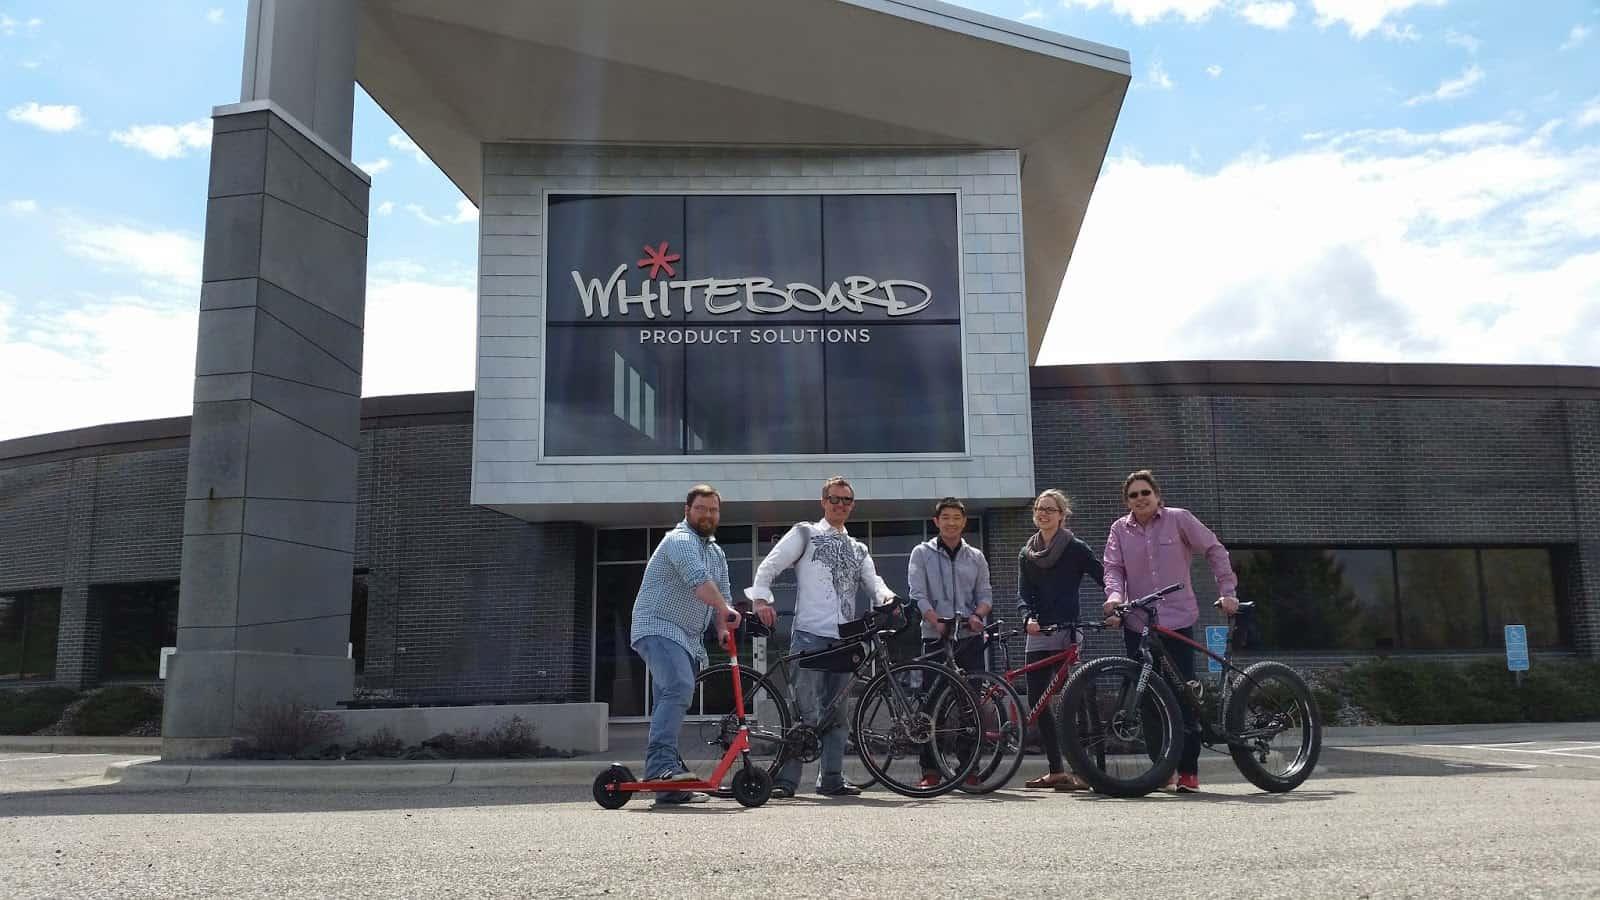 WhiteBoard Product Development